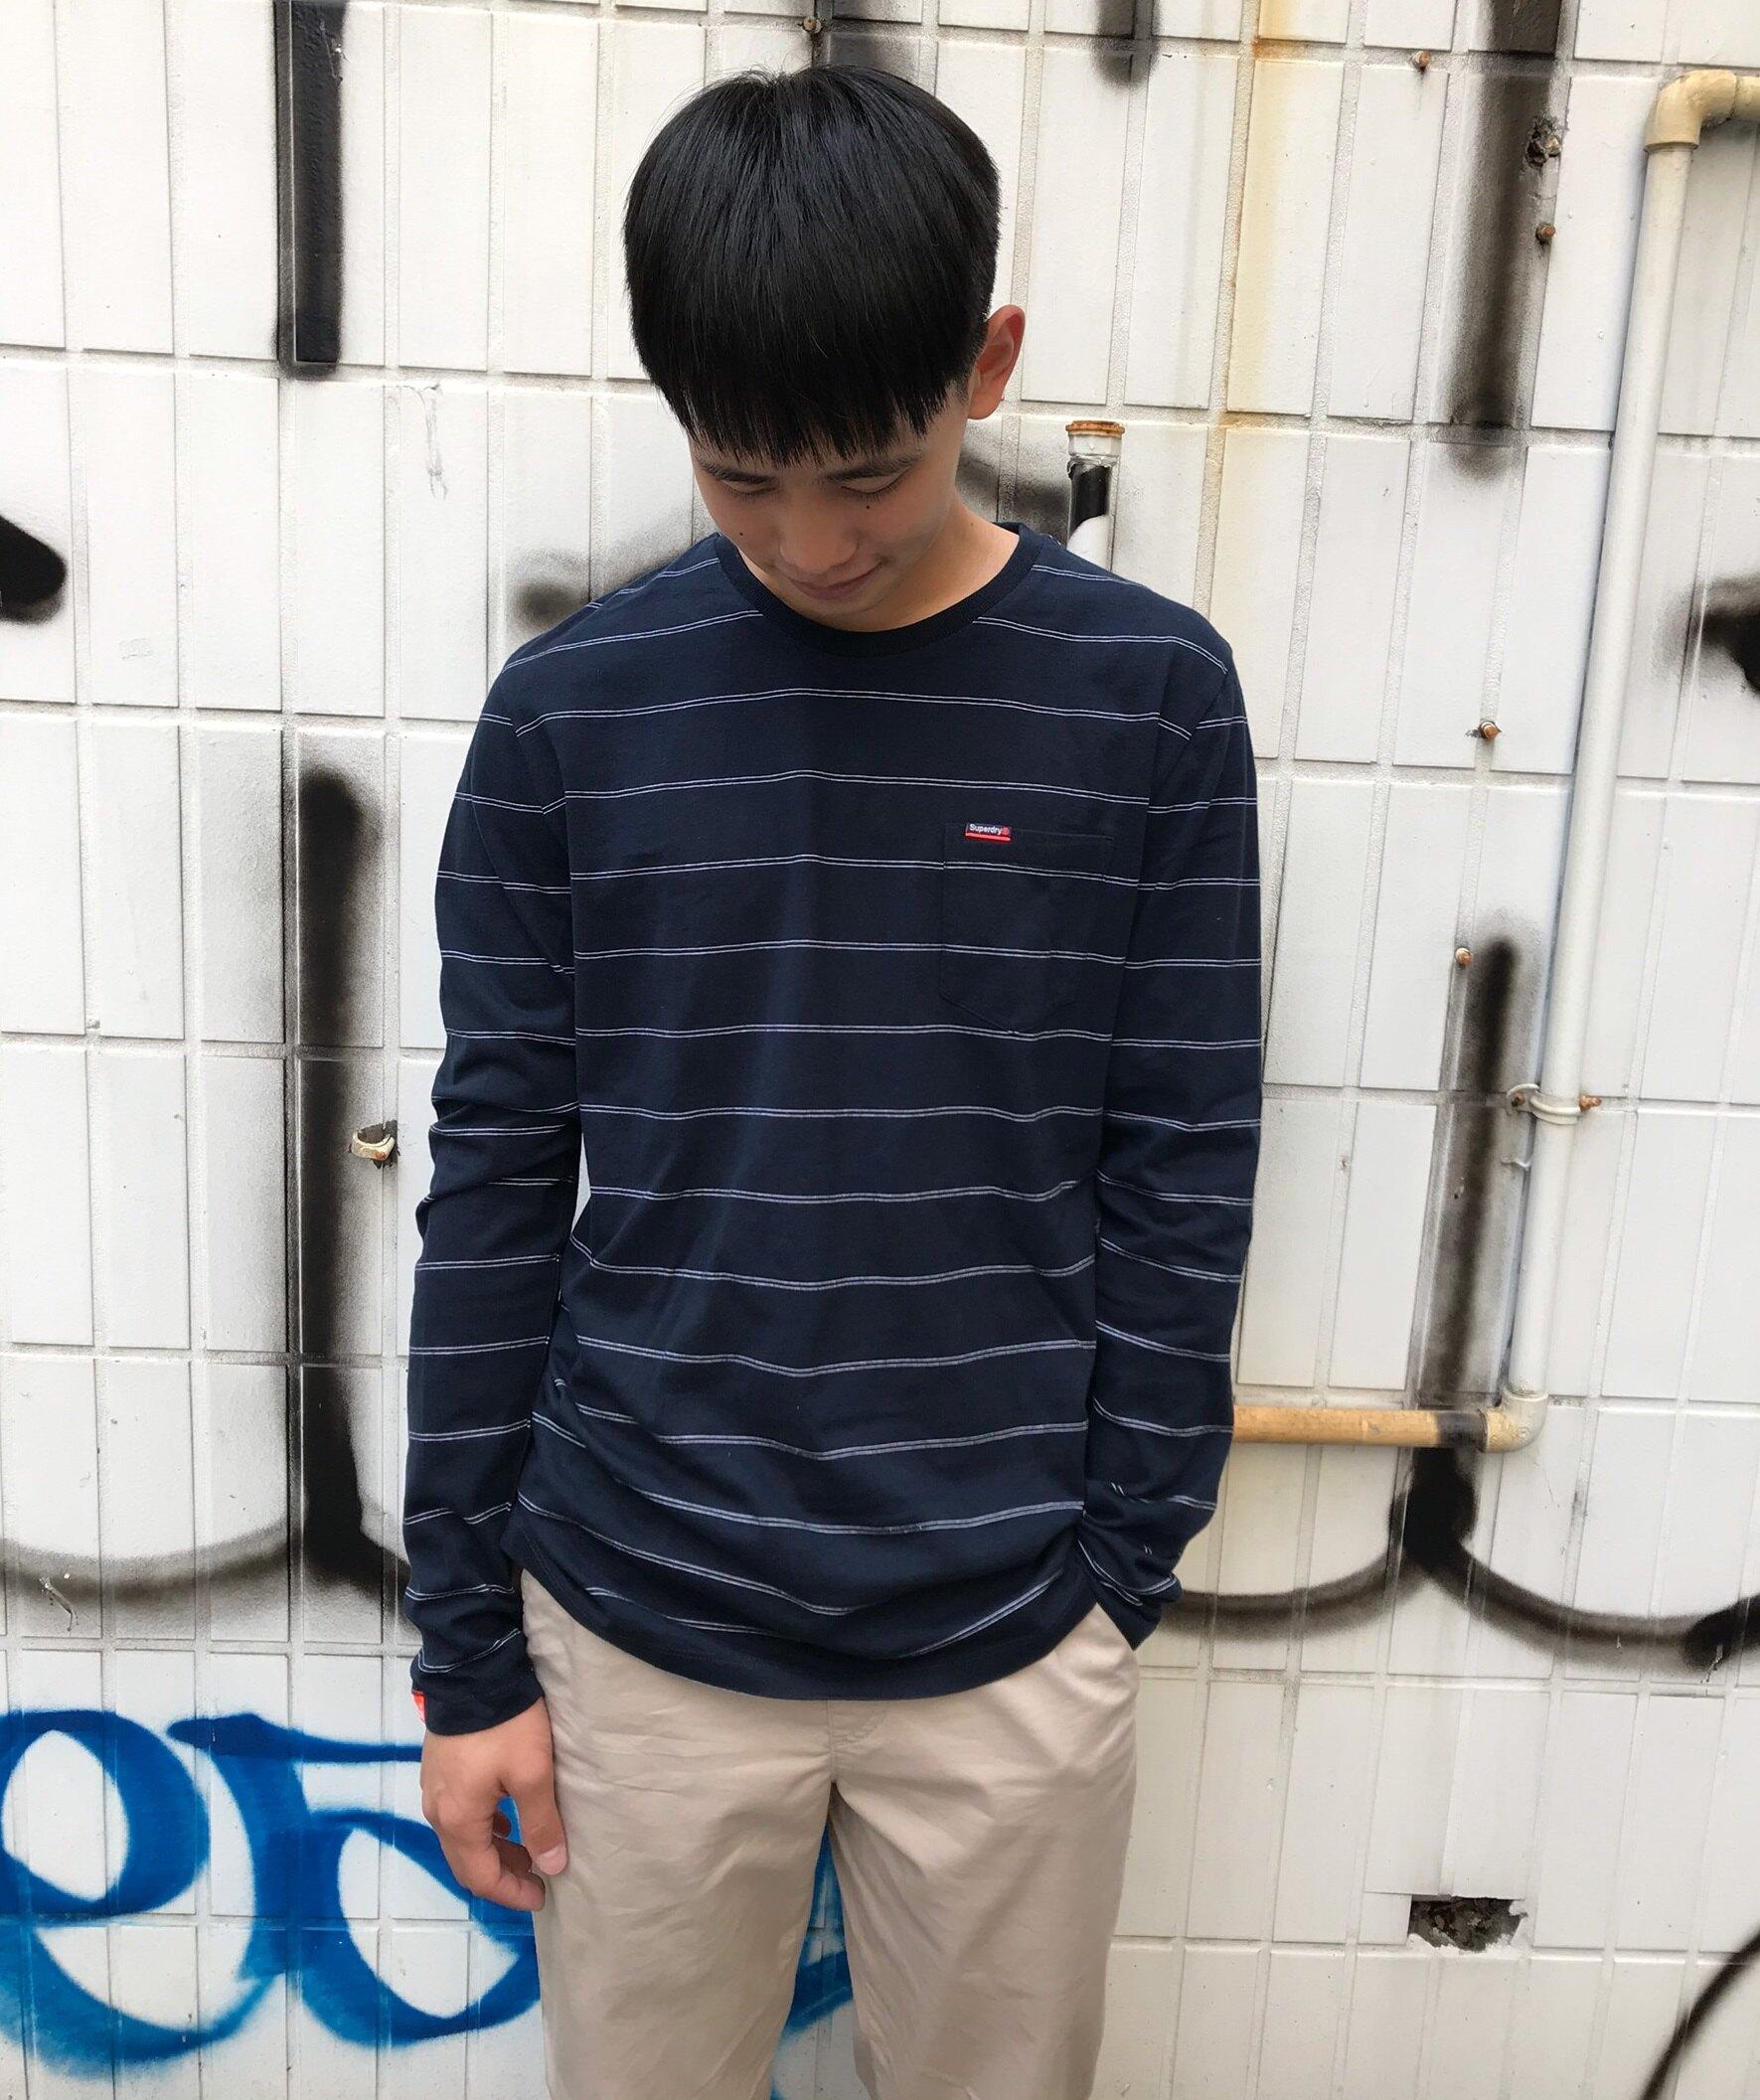 Superdry 極度乾燥 男款 簡約刺繡 經典圓領素色長袖T恤 英國正品現貨-海軍藍條紋